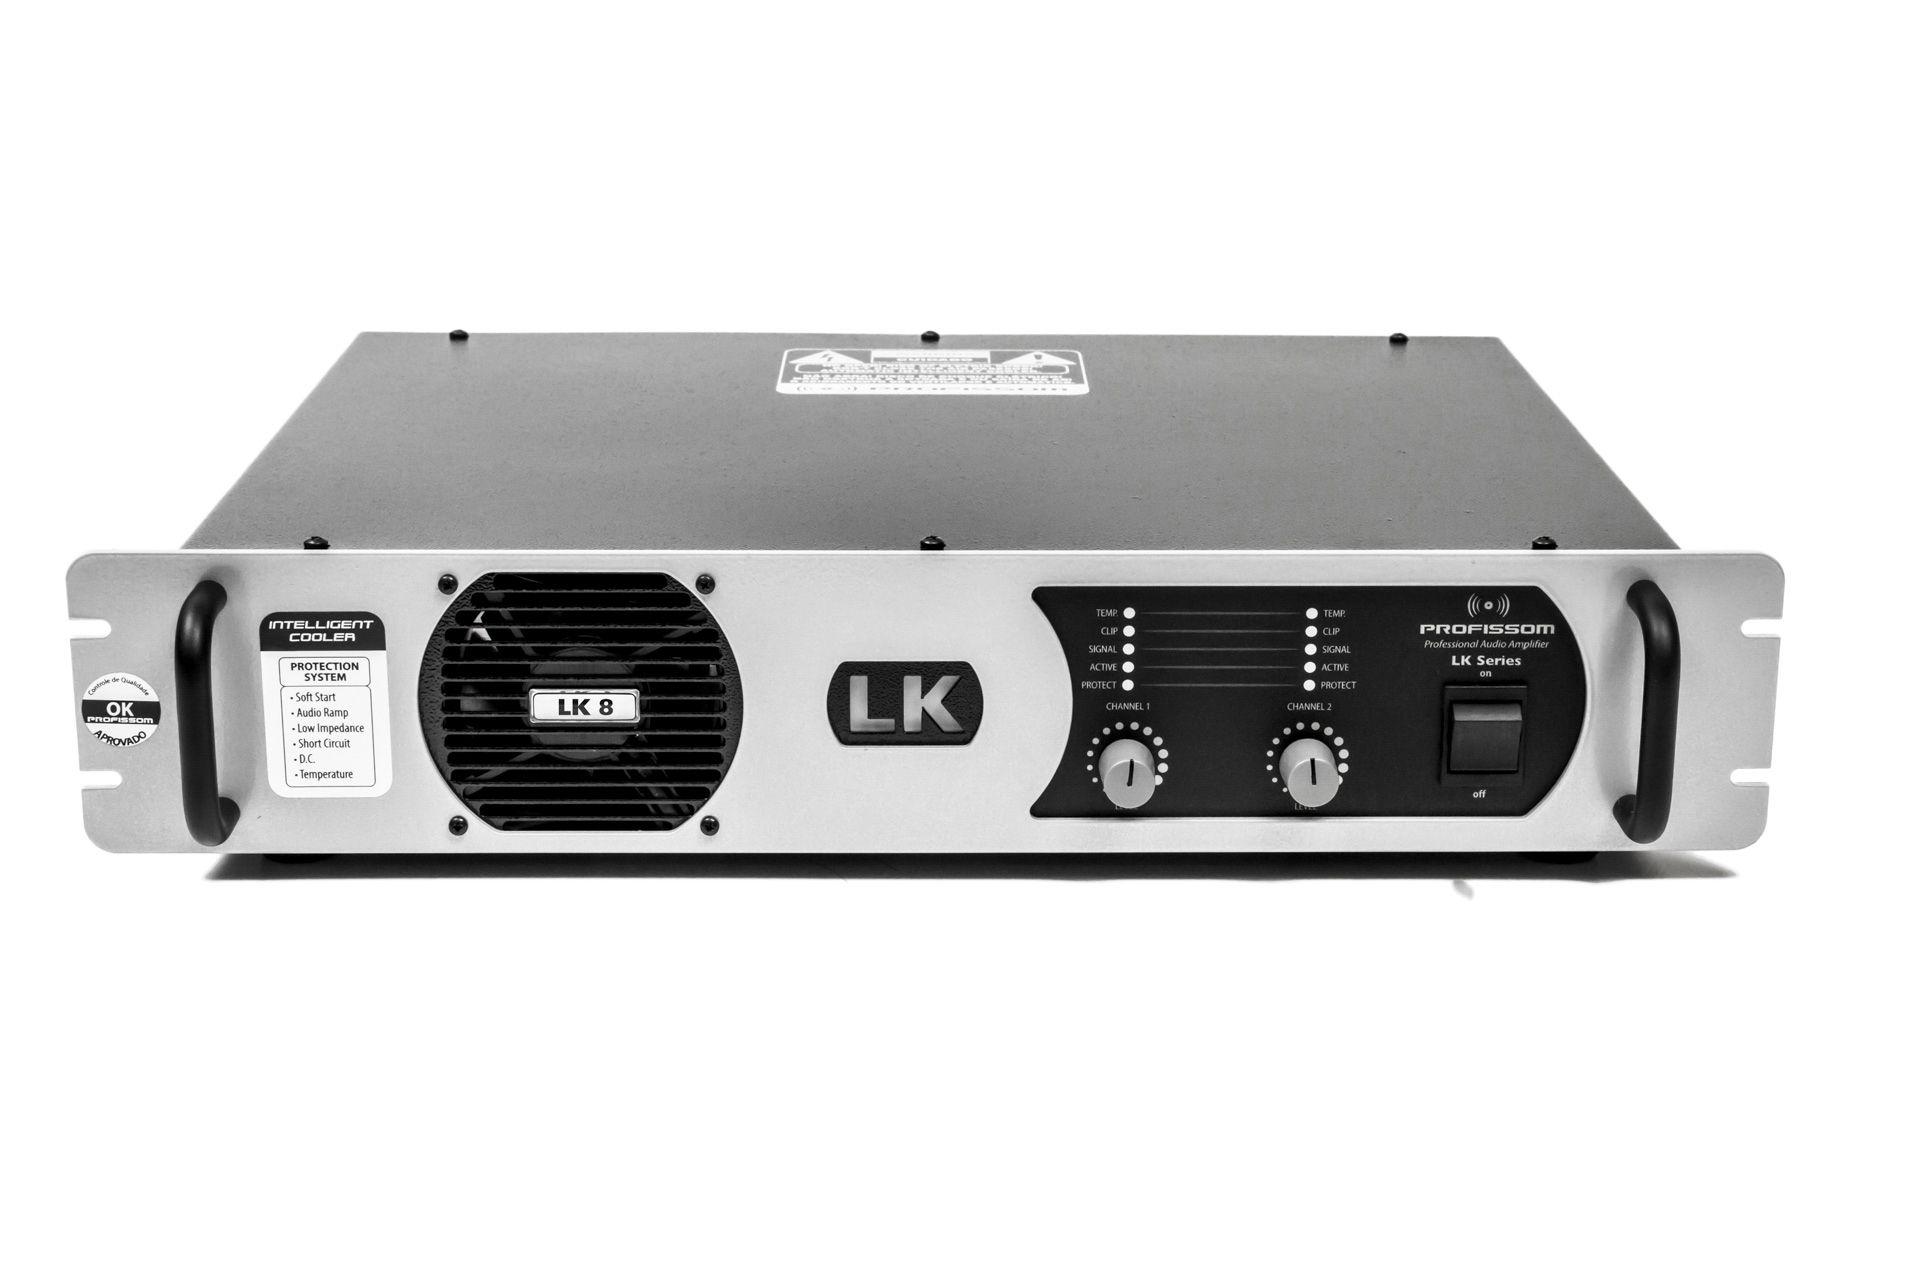 Amplificador Profissom LK 8 (1.600 W rms · 4 ohms)